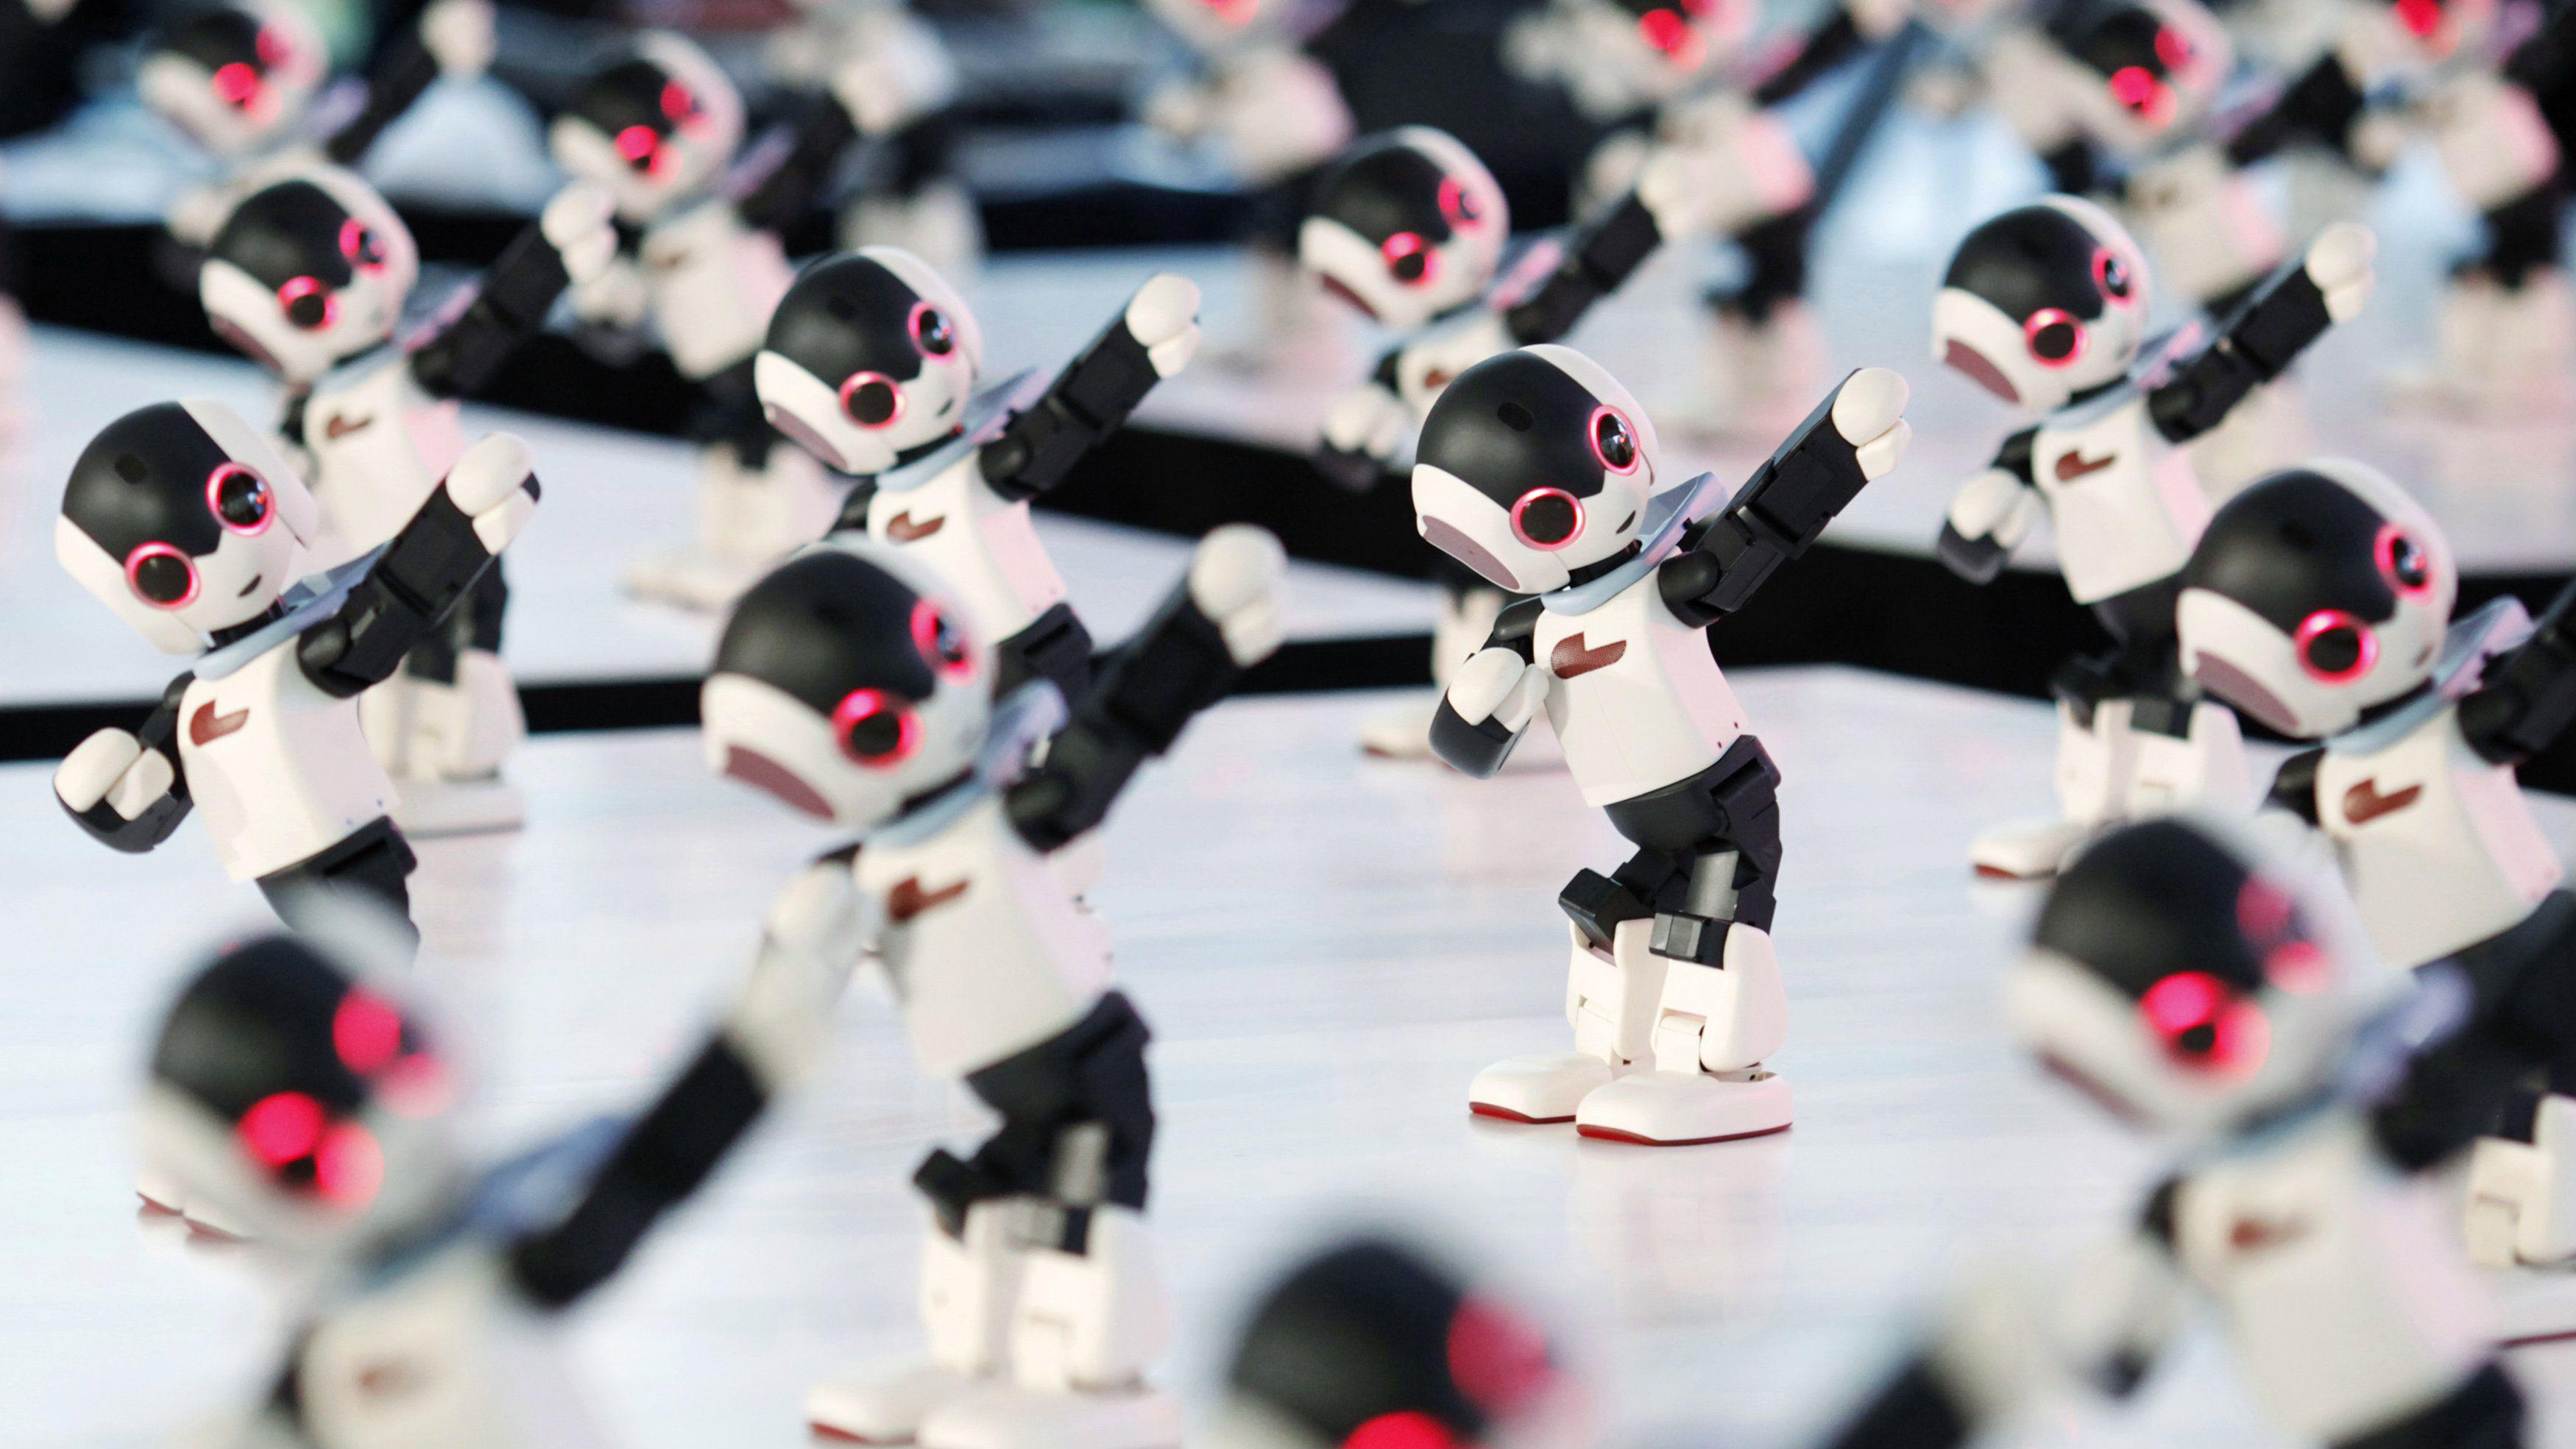 group-of-dancing-robots